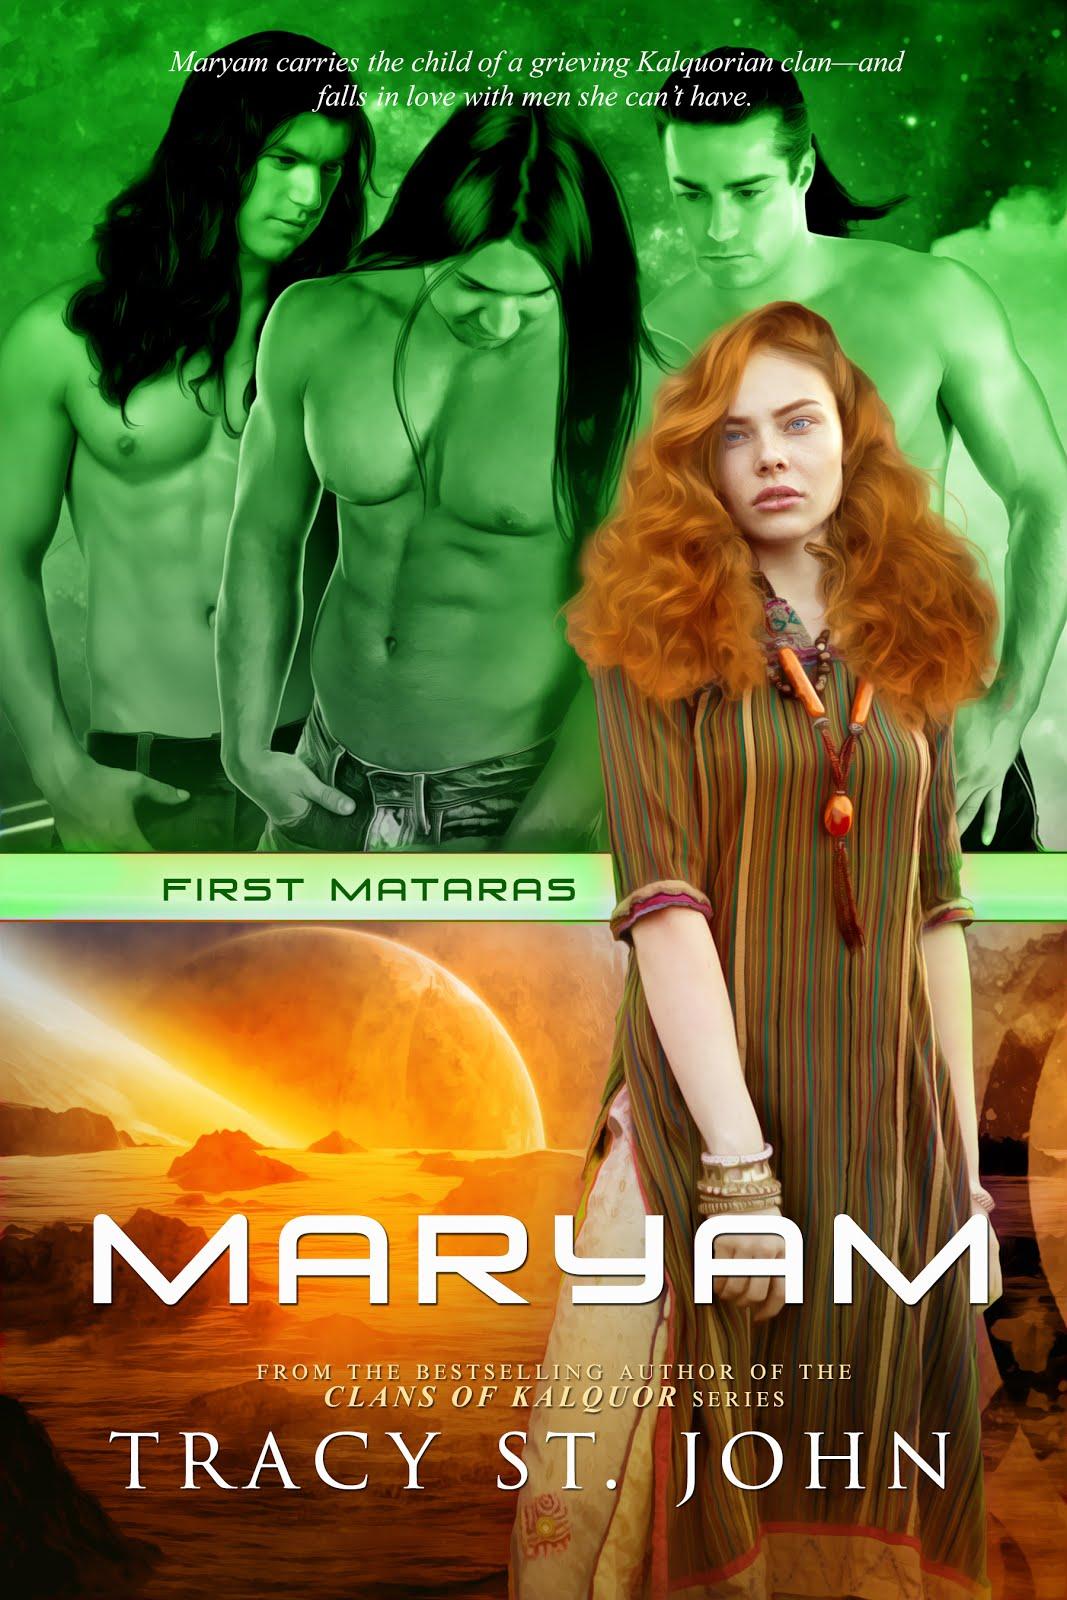 First Mataras: Maryam